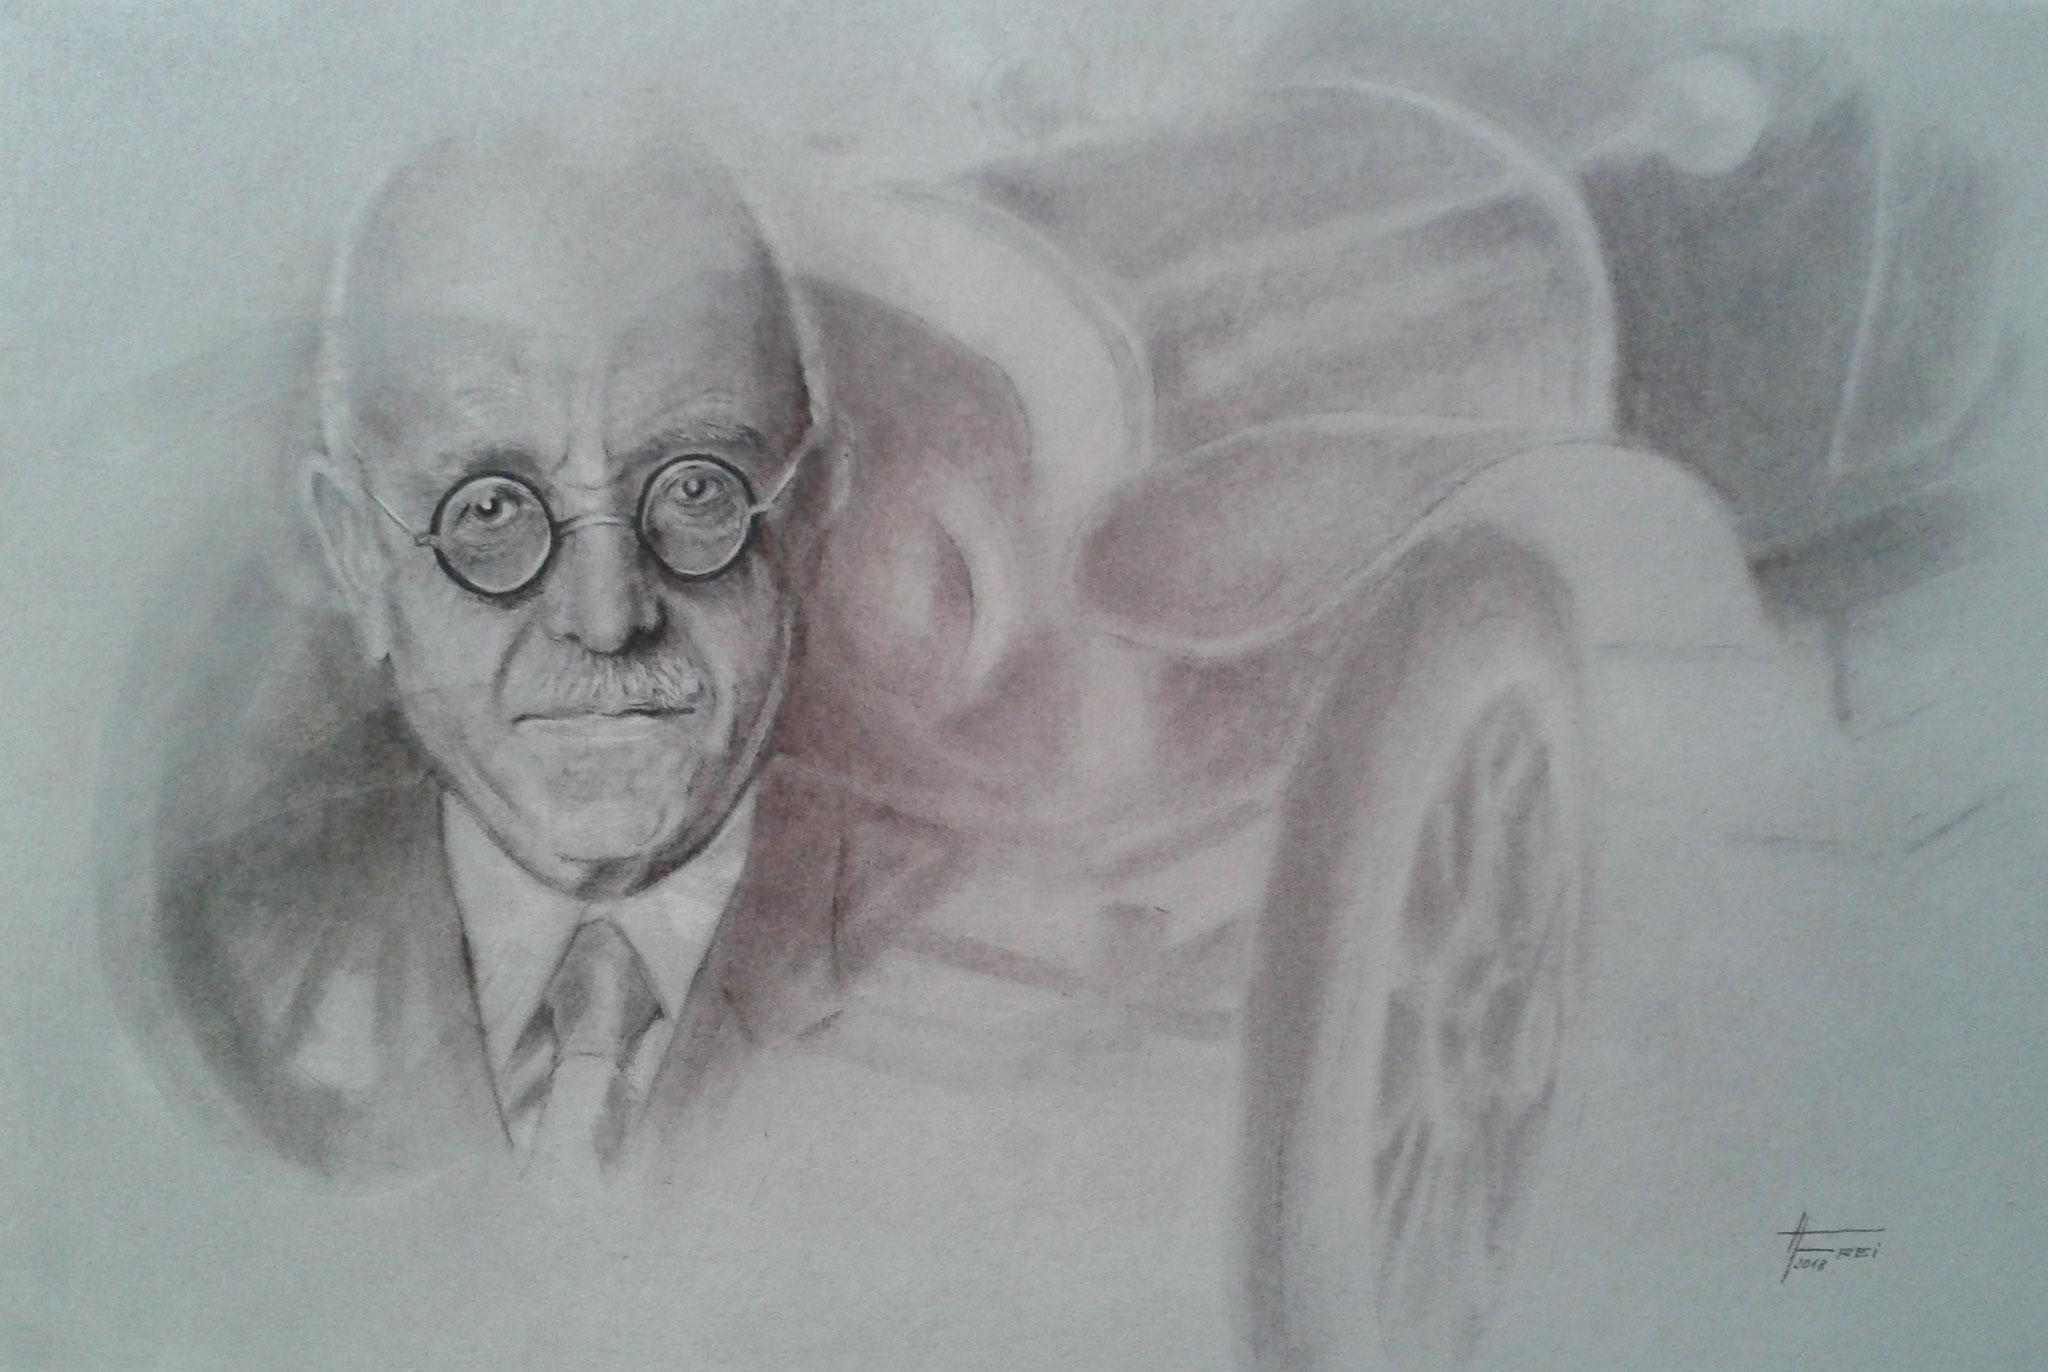 ART HFrei - Horch/Audi - Rückblick 1910